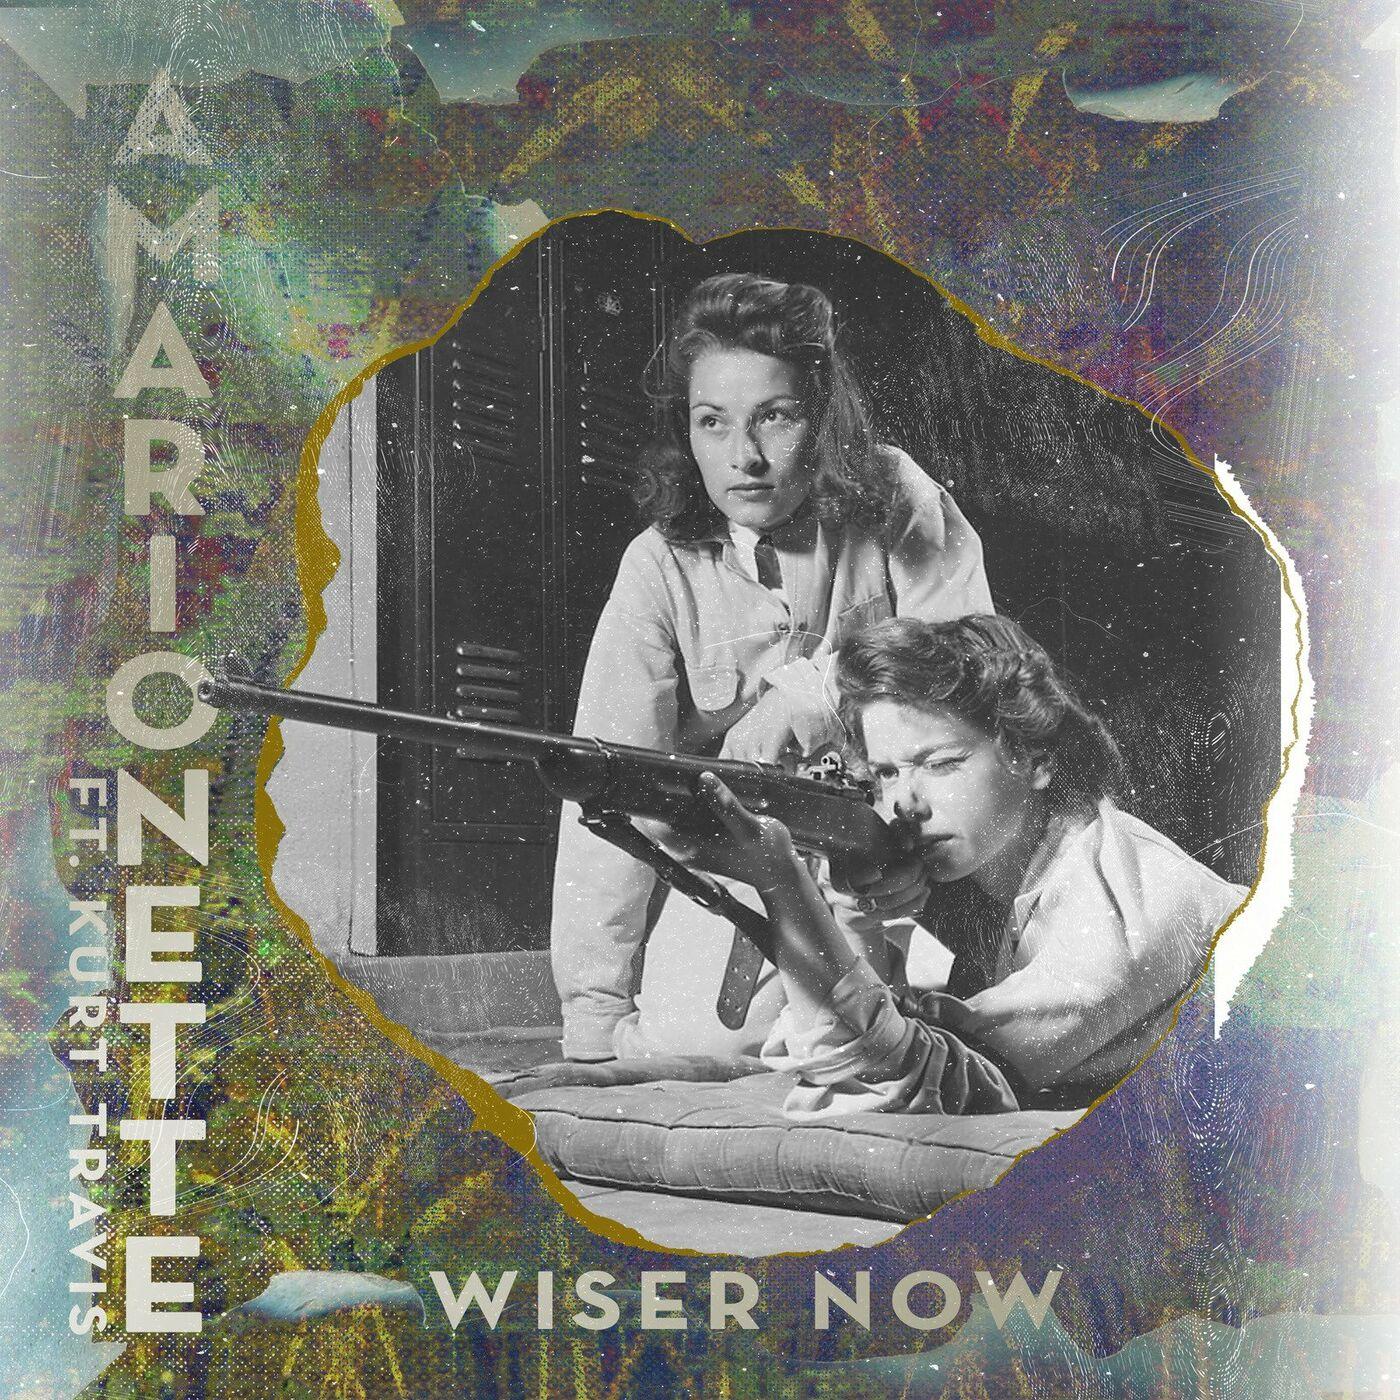 Amarionette - Wiser Now [single] (2019)